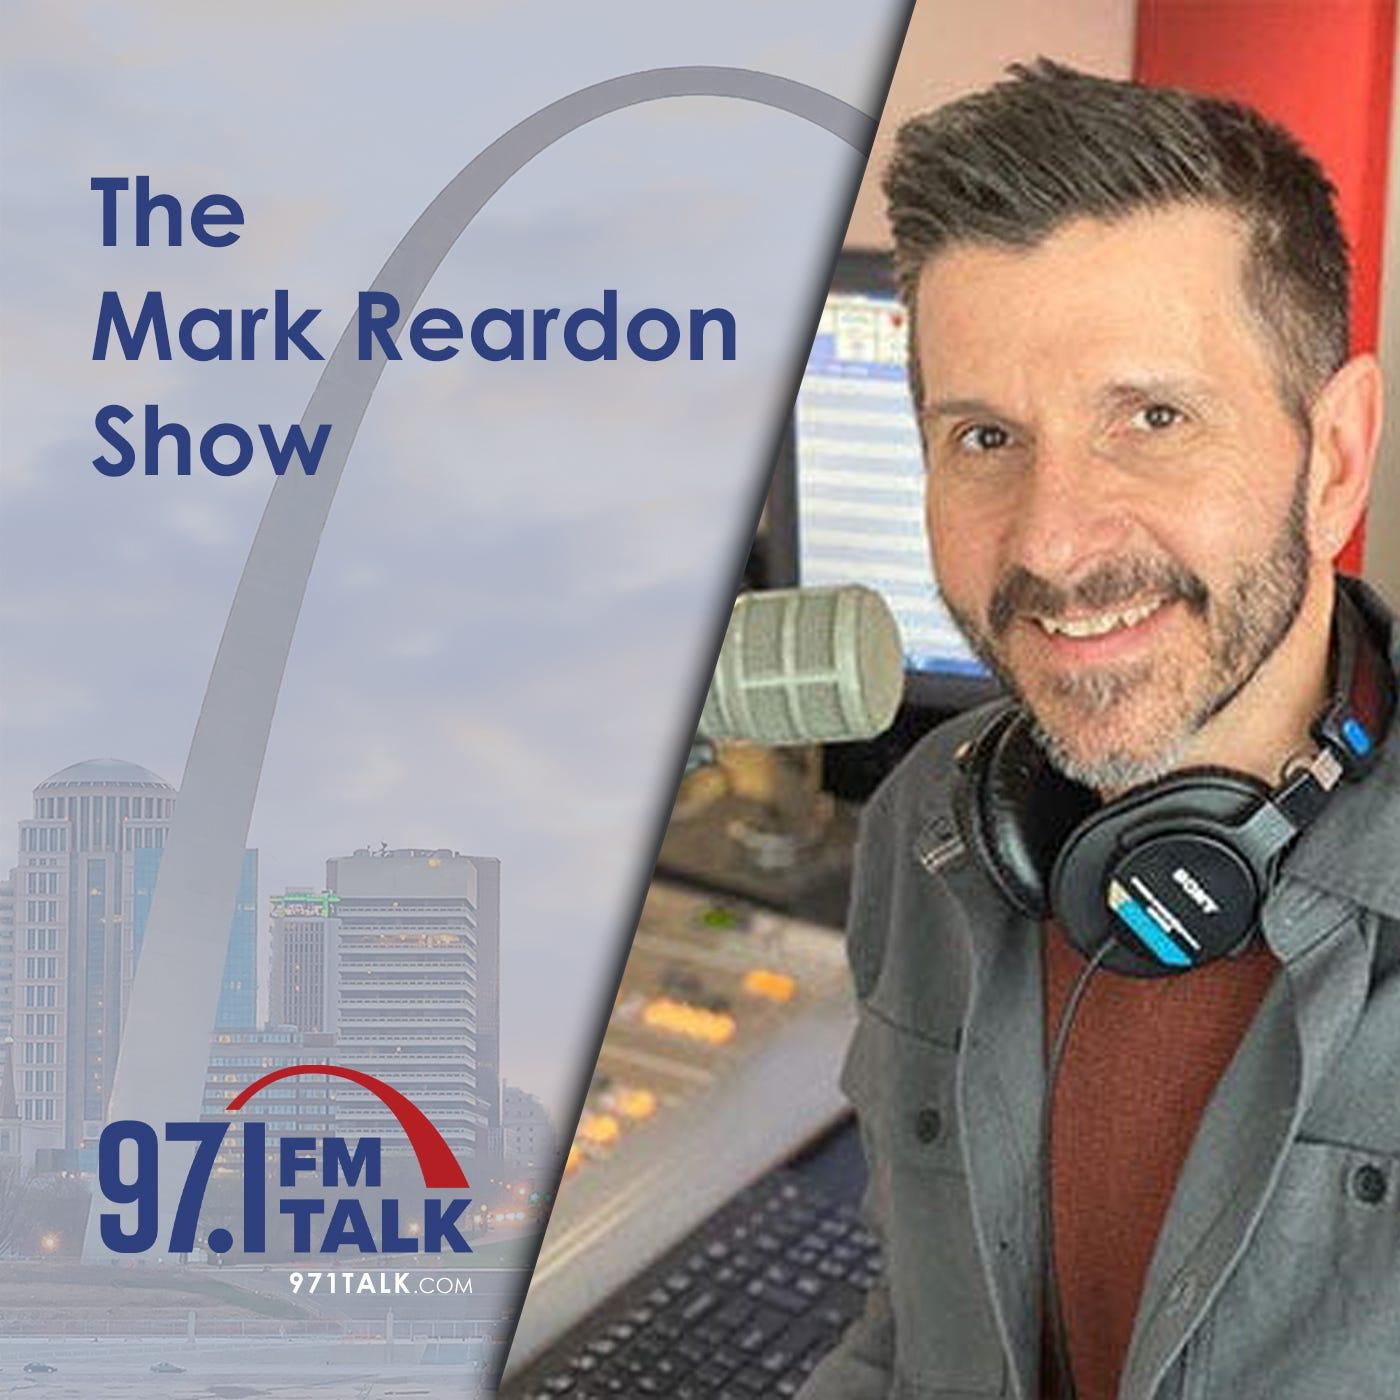 Mark Reardon Show